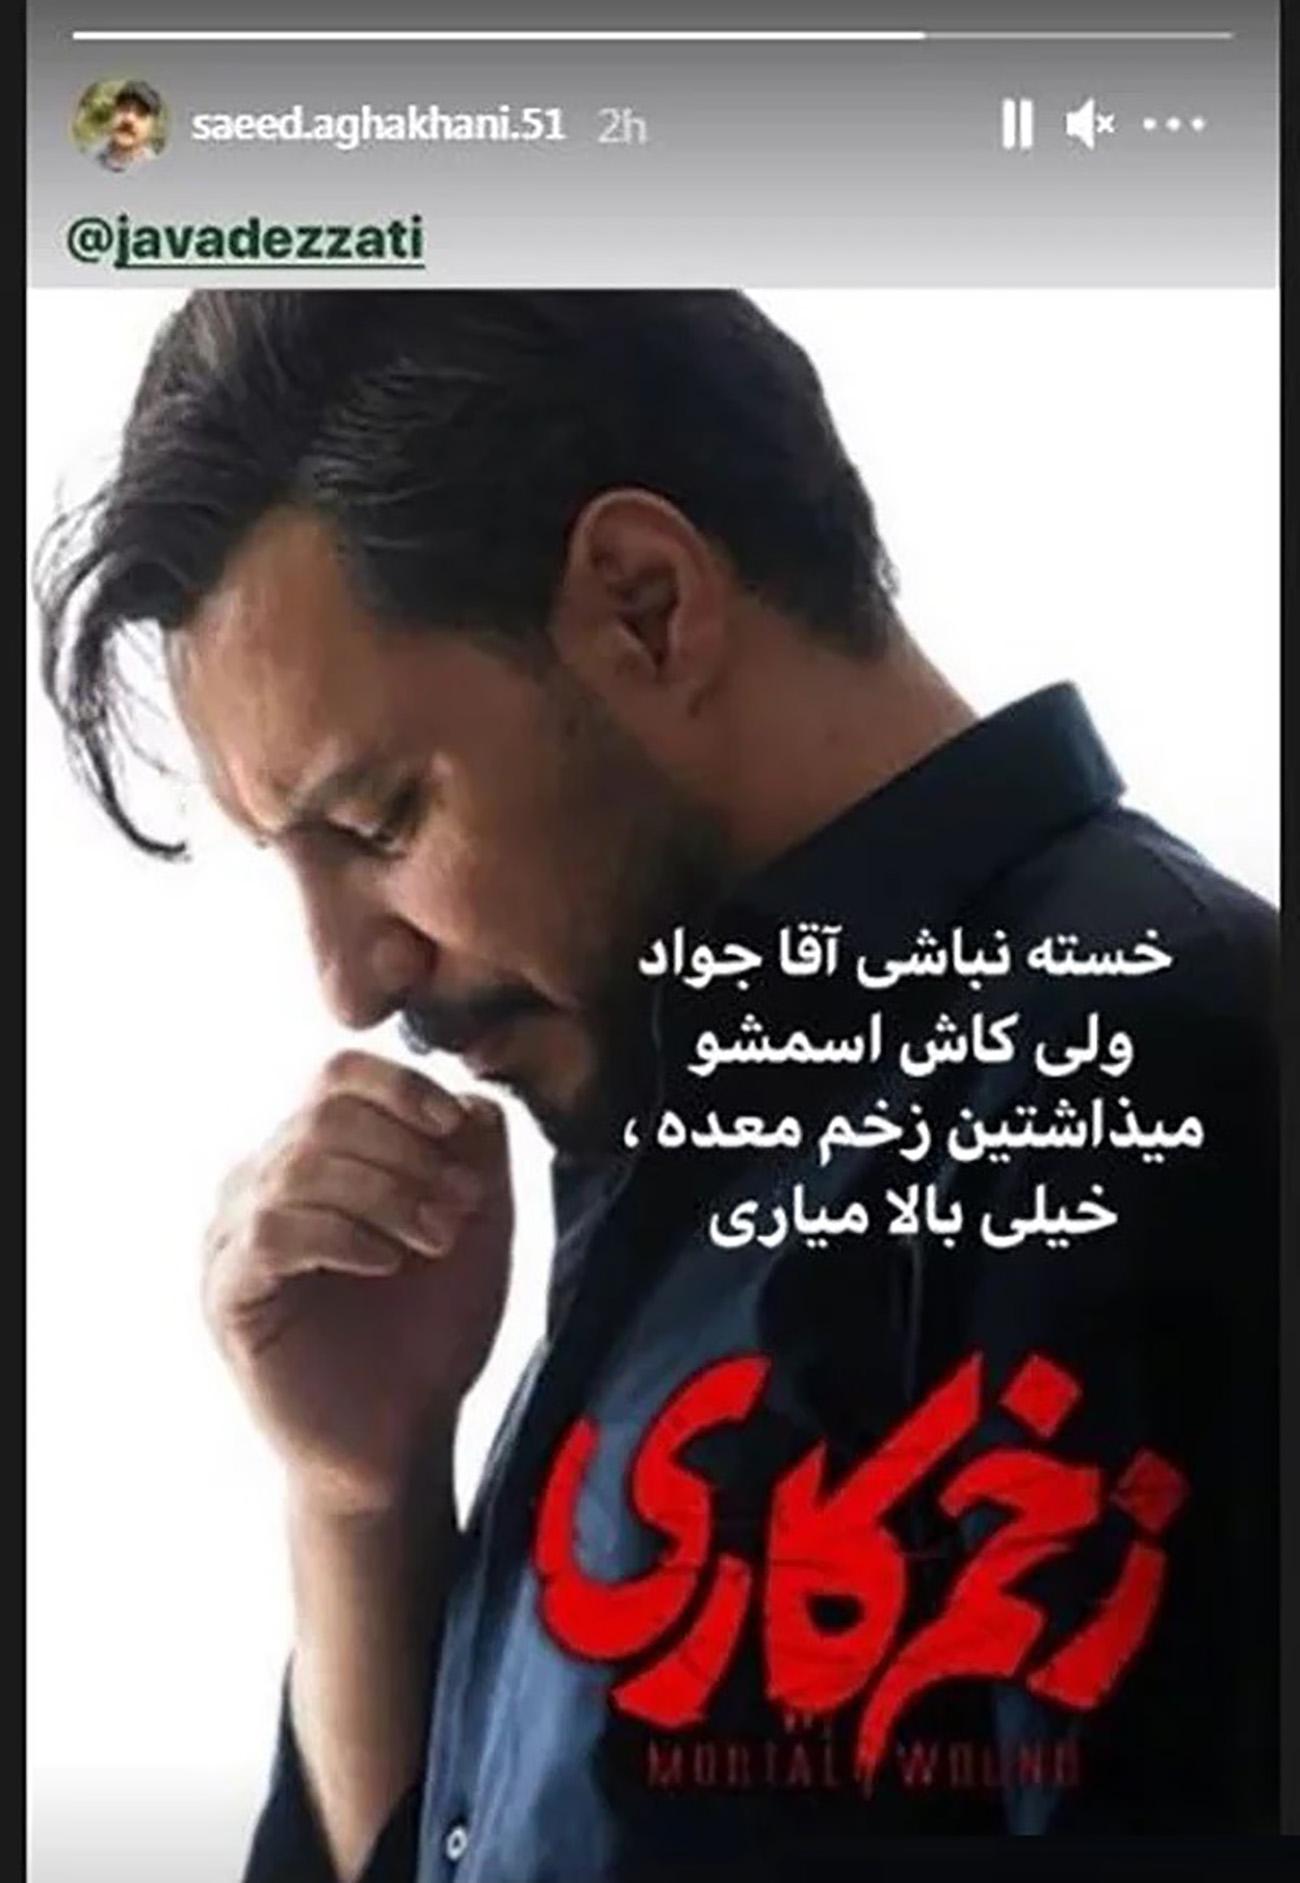 زخم کاری / جواد عزتی